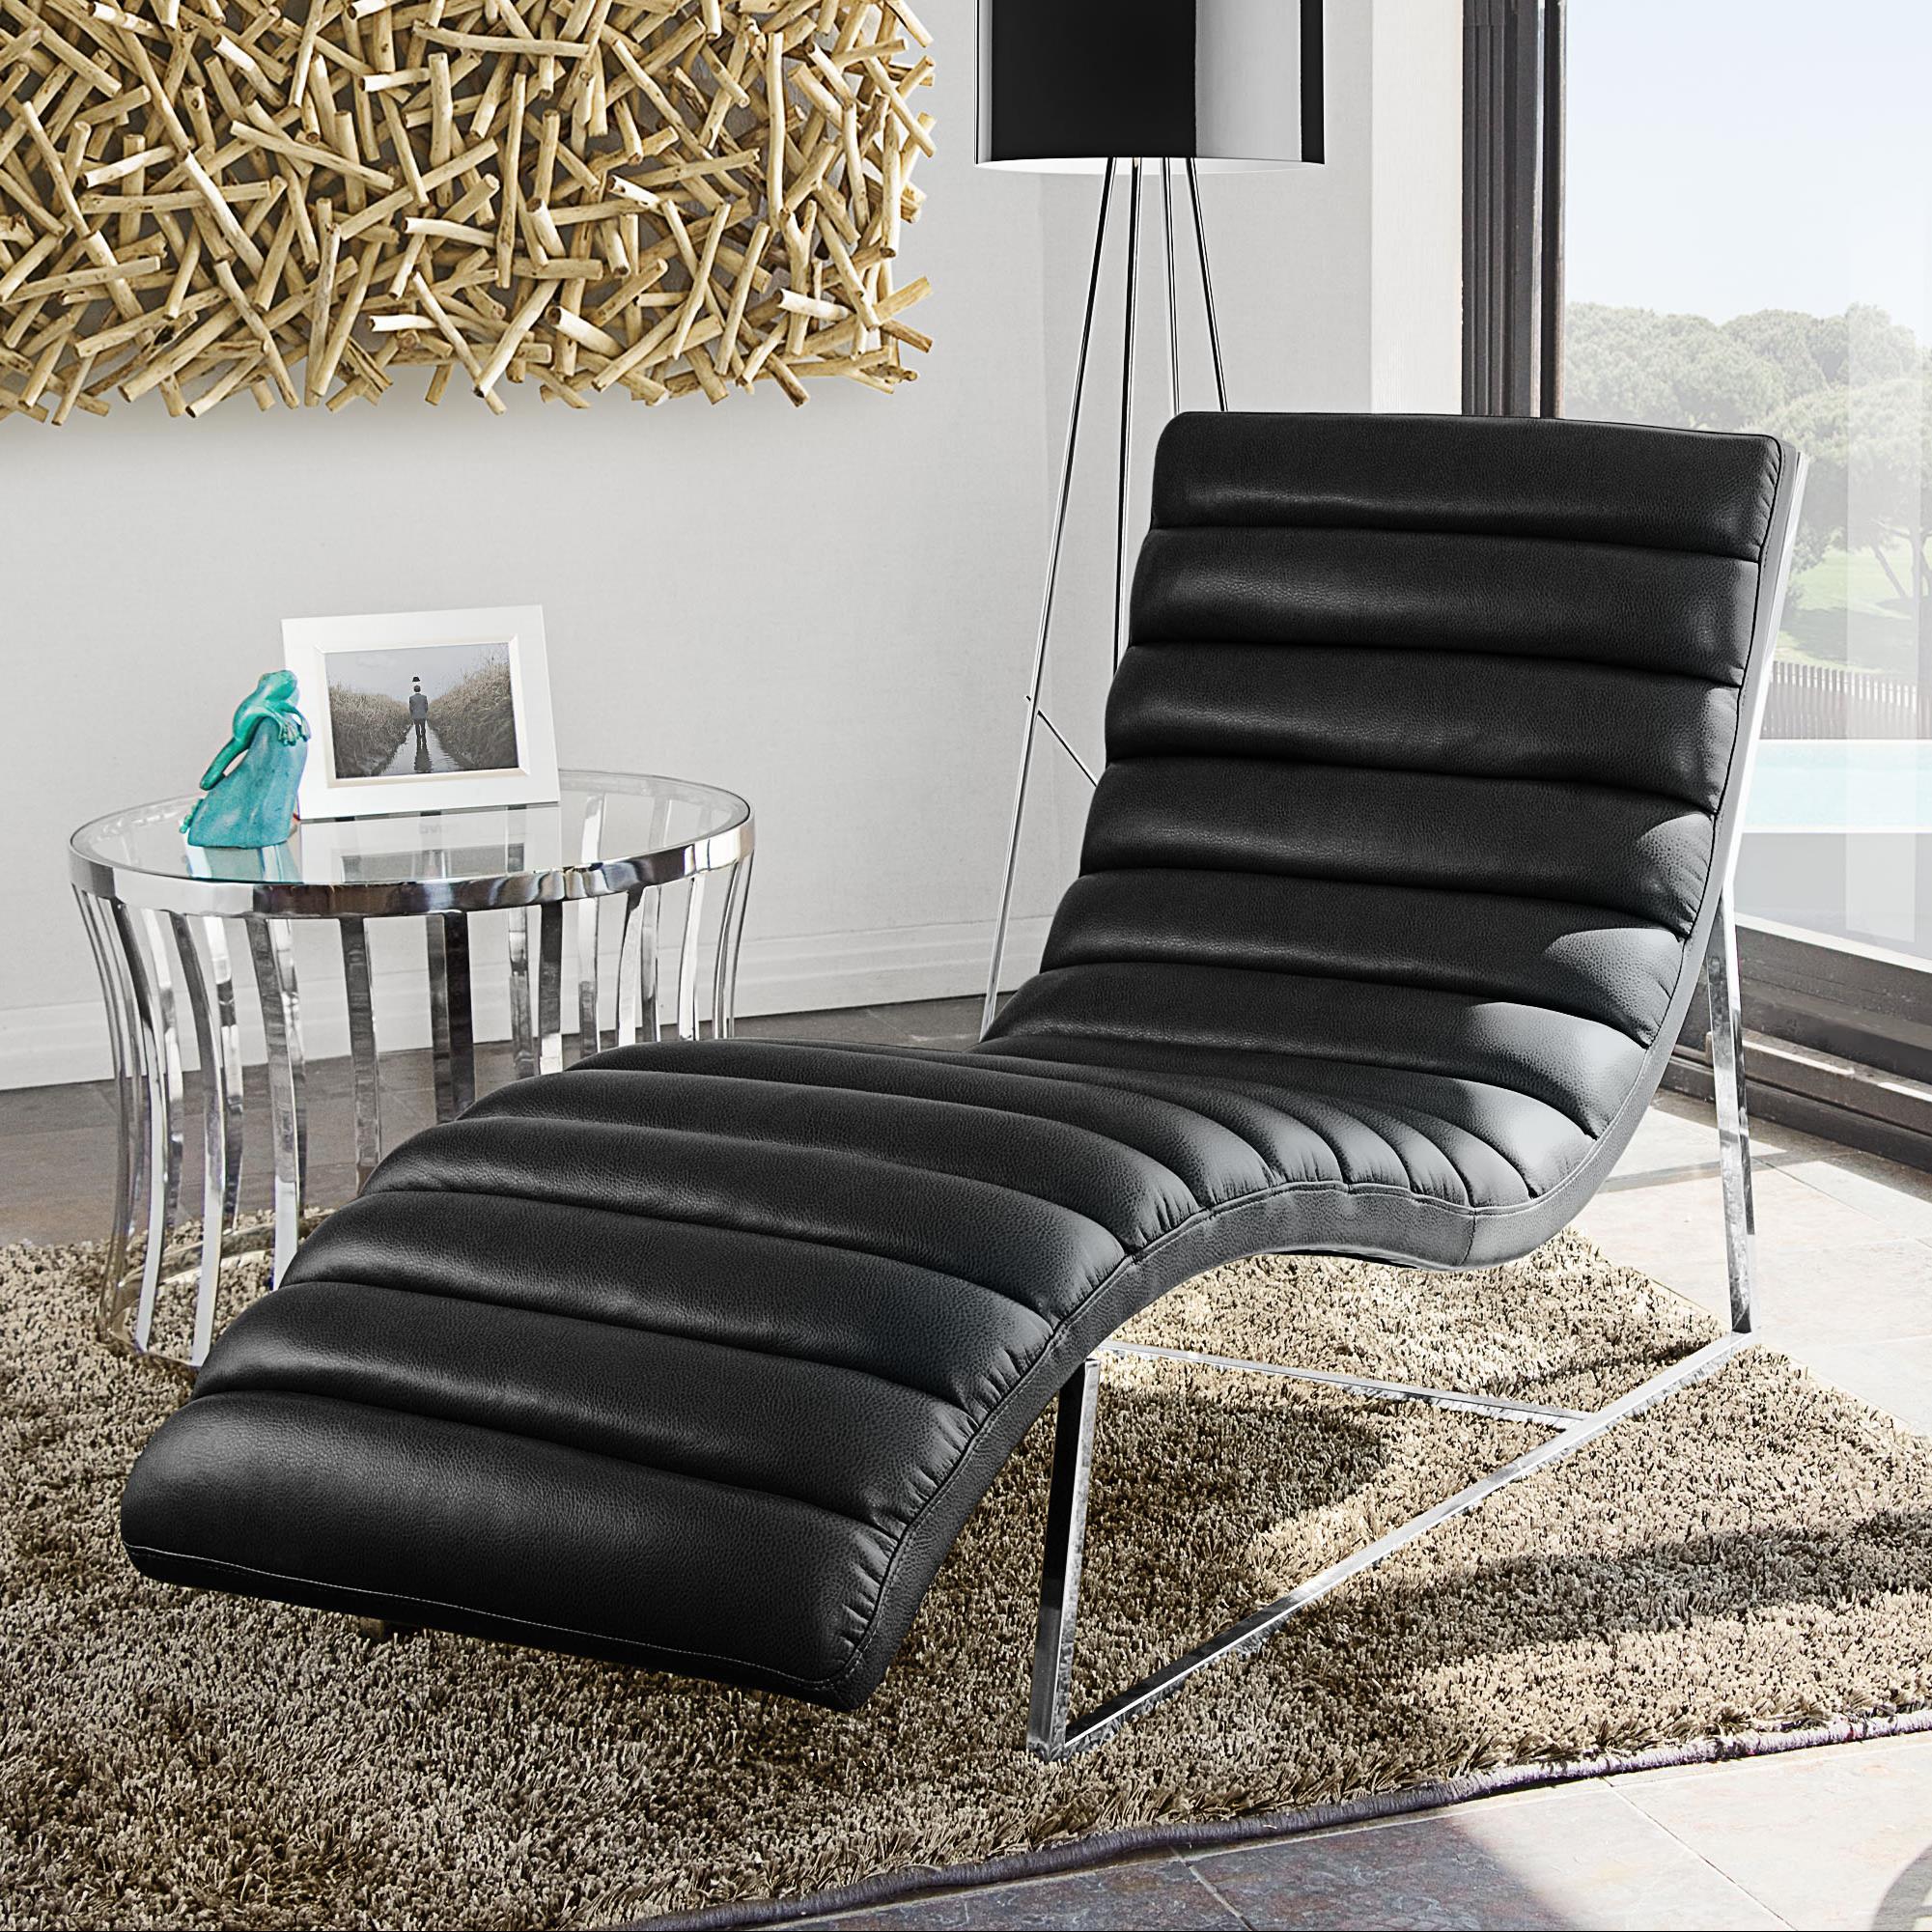 diamond sofa bardot black chaise lounge red knot chaises. Black Bedroom Furniture Sets. Home Design Ideas